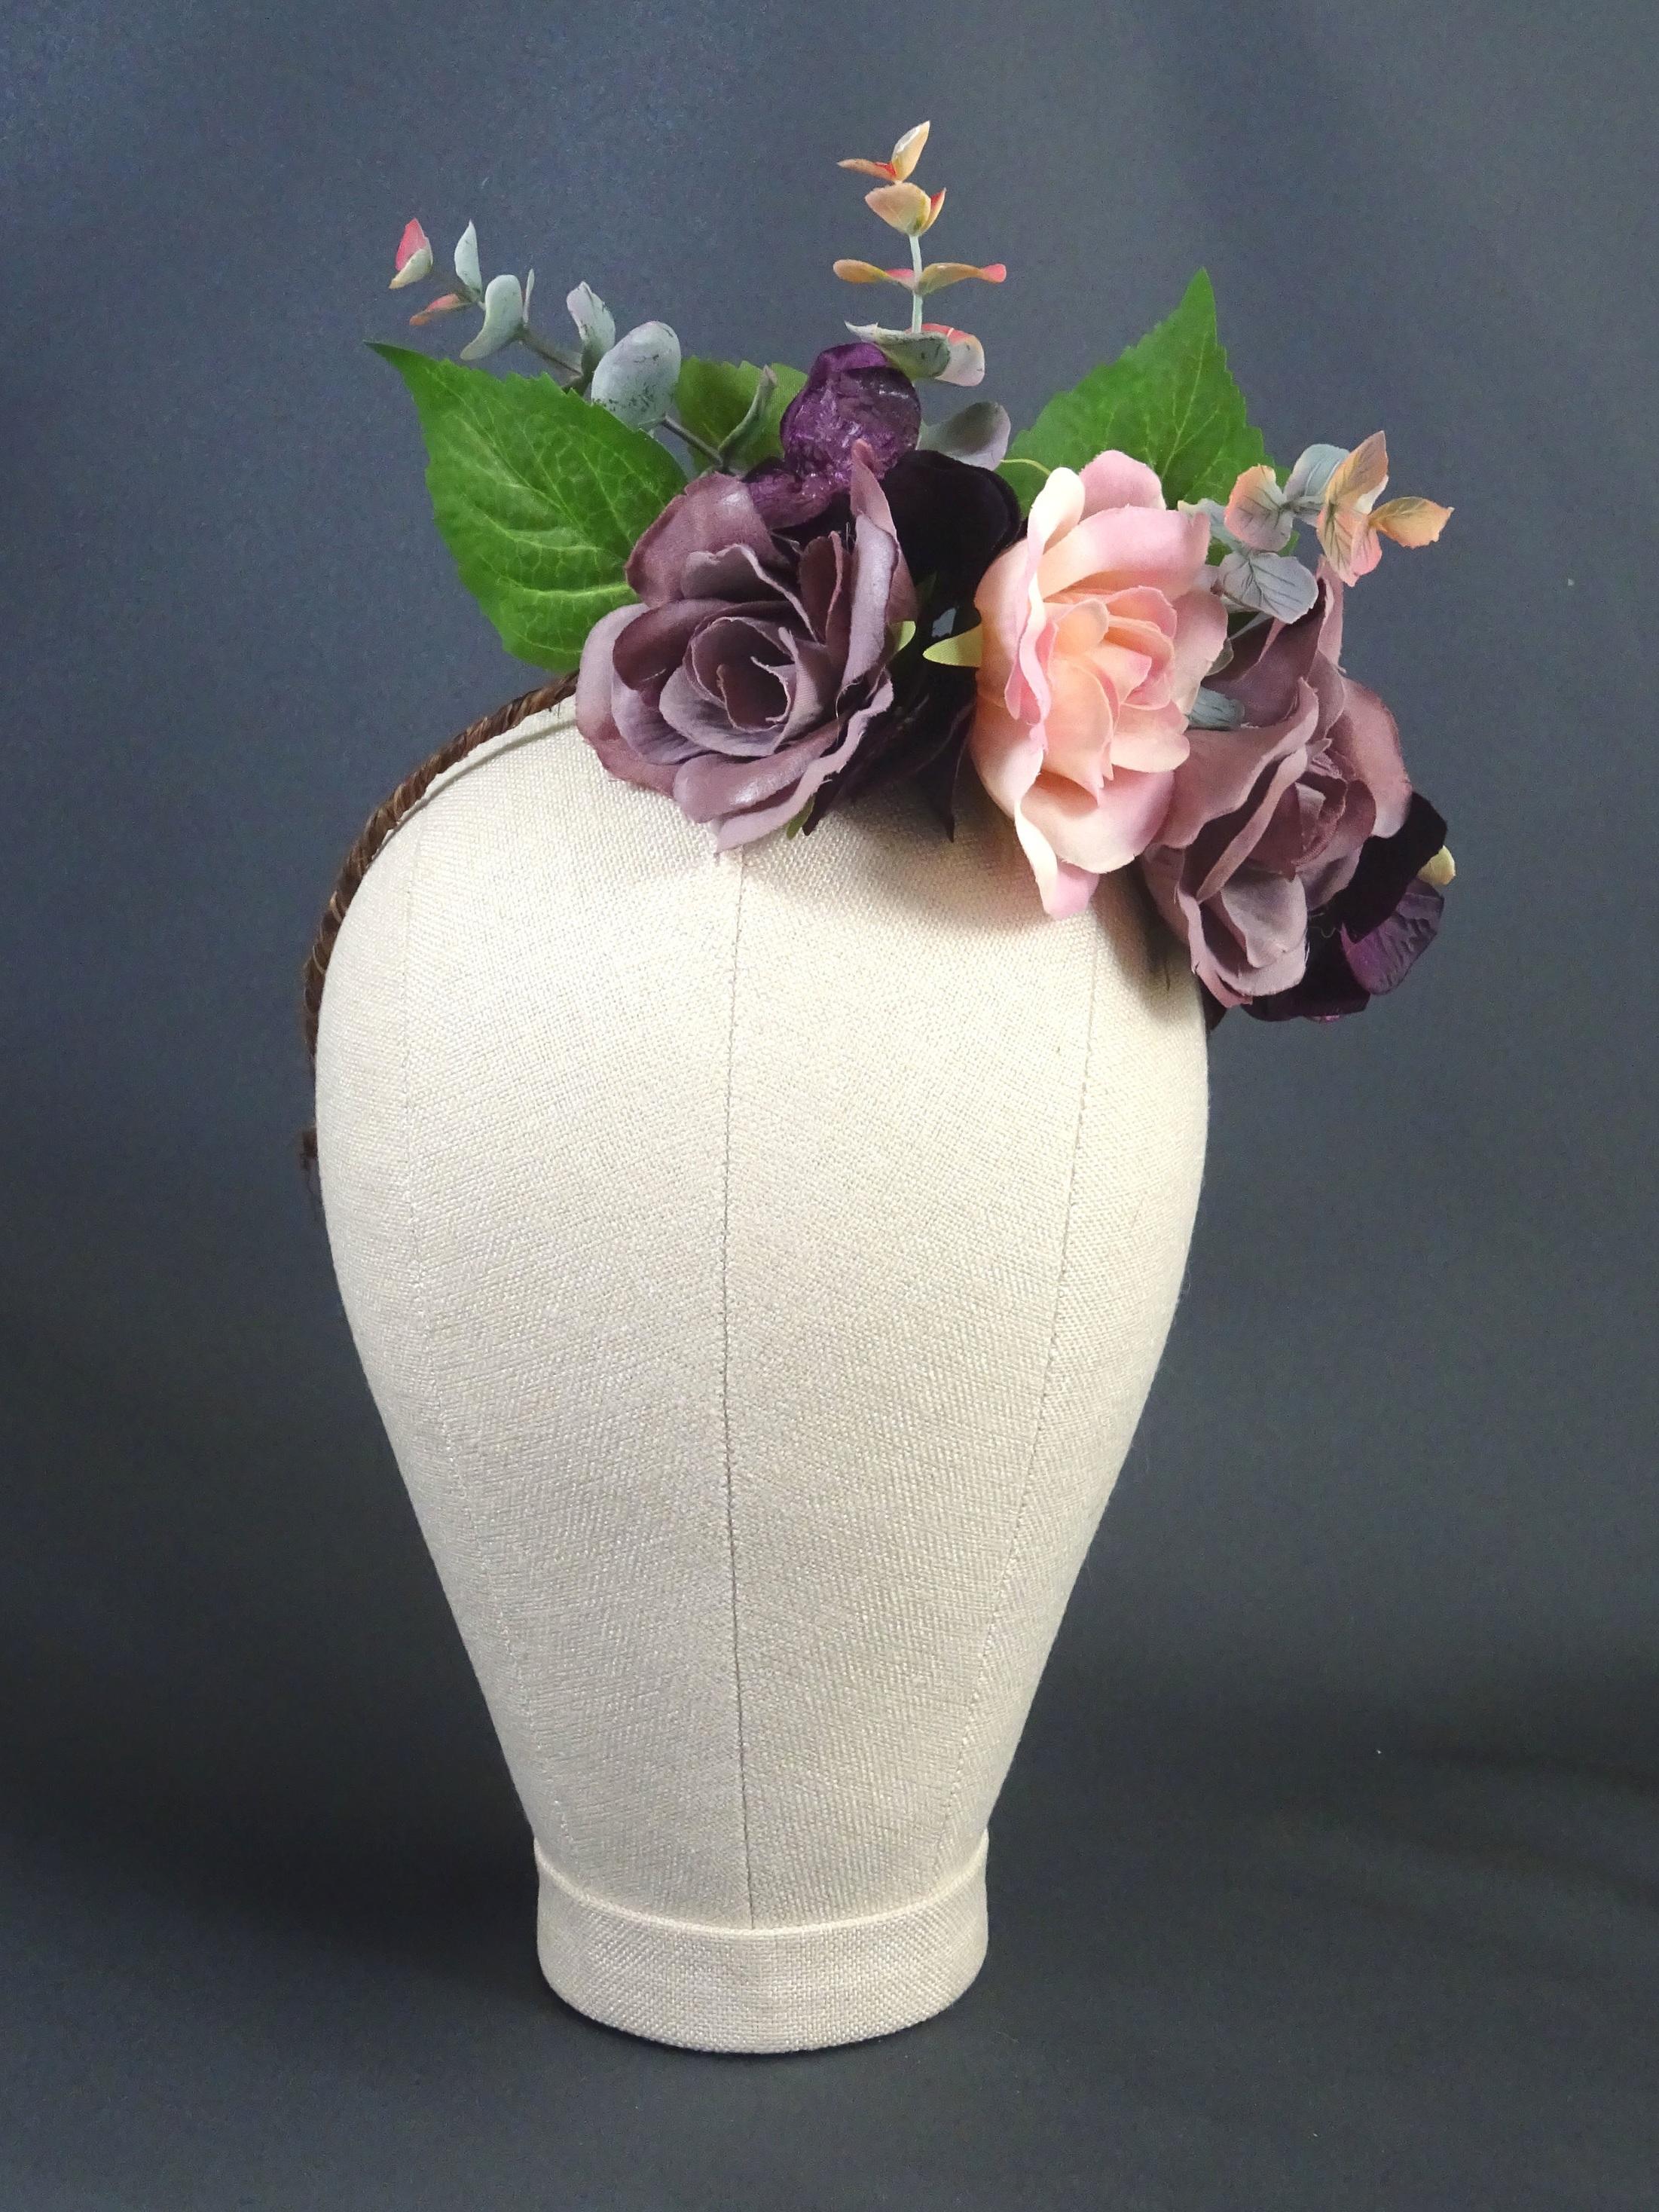 flower+crown+headband%2C+festival+accessories%2C+rose+flower+crown.jpg